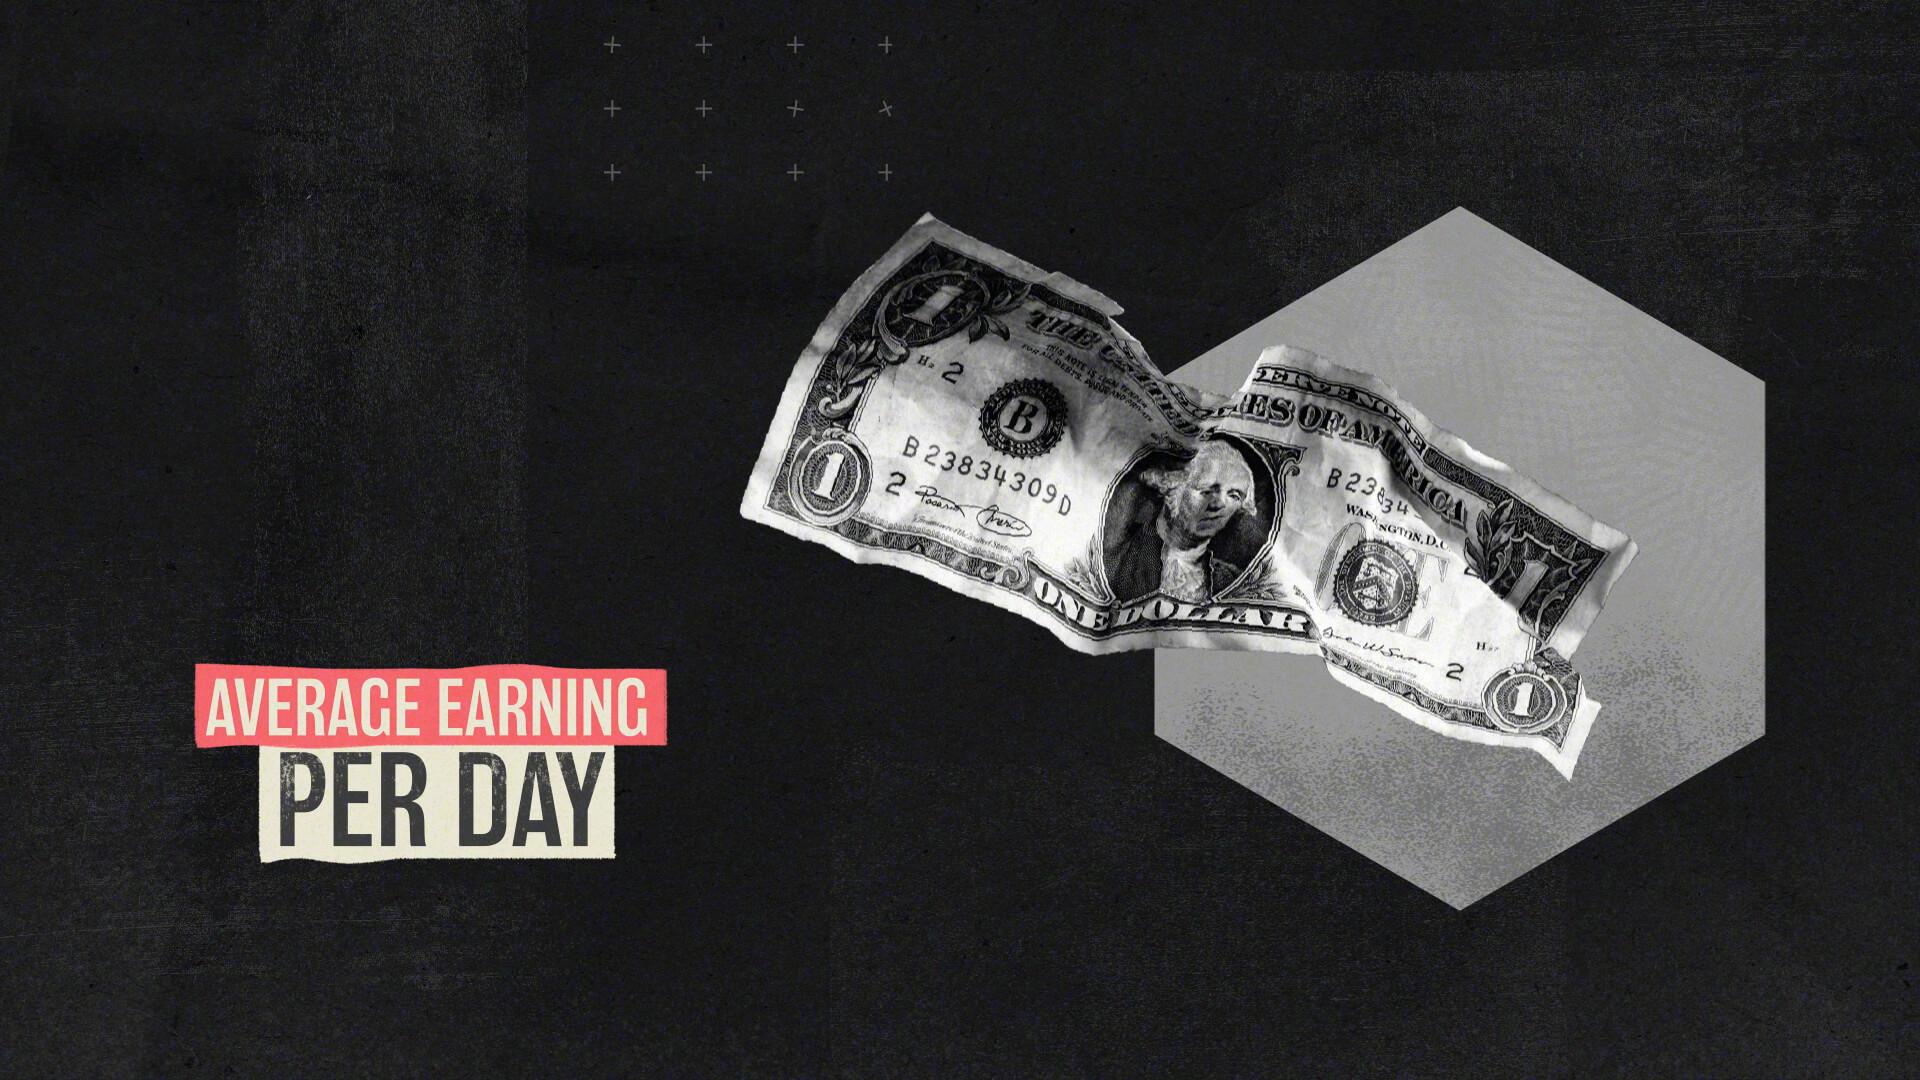 Average earning infographic design